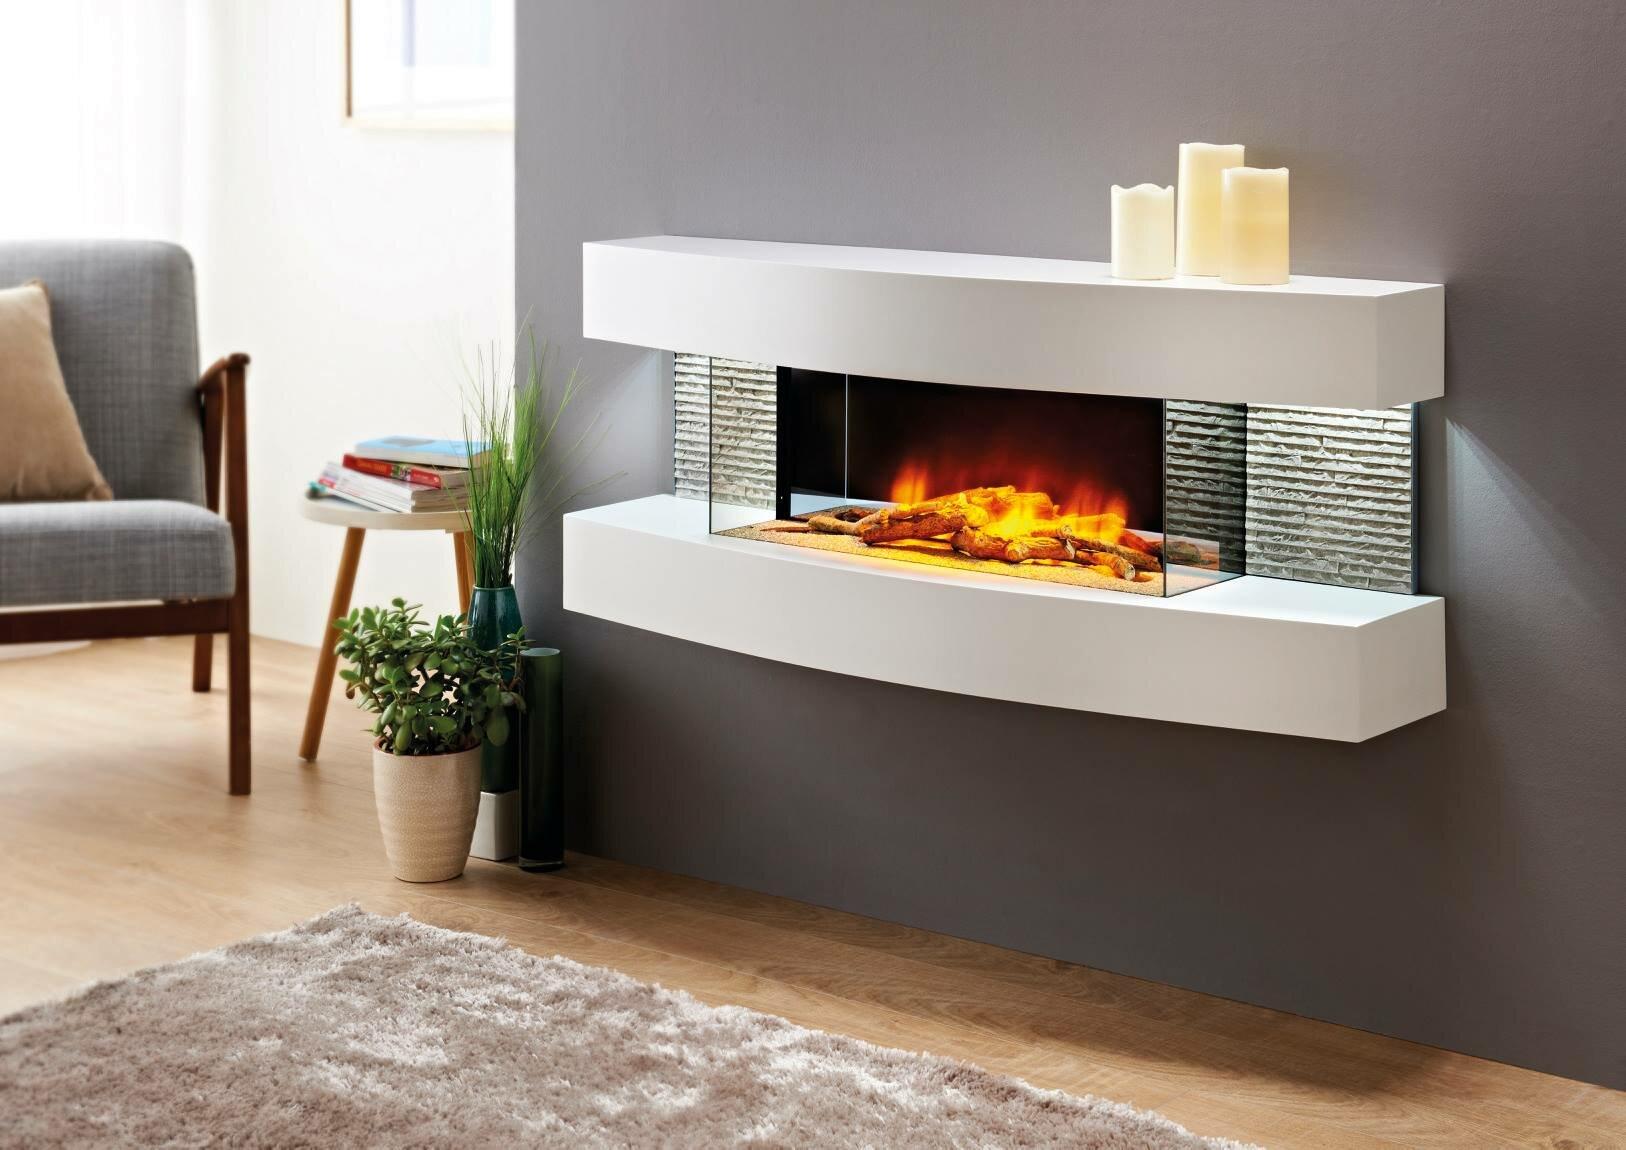 orren ellis fraenzel curve wall mounted electric fireplace reviews rh wayfair com wall mounted electric fireplace amazon wall mounted electric fireplace amazon